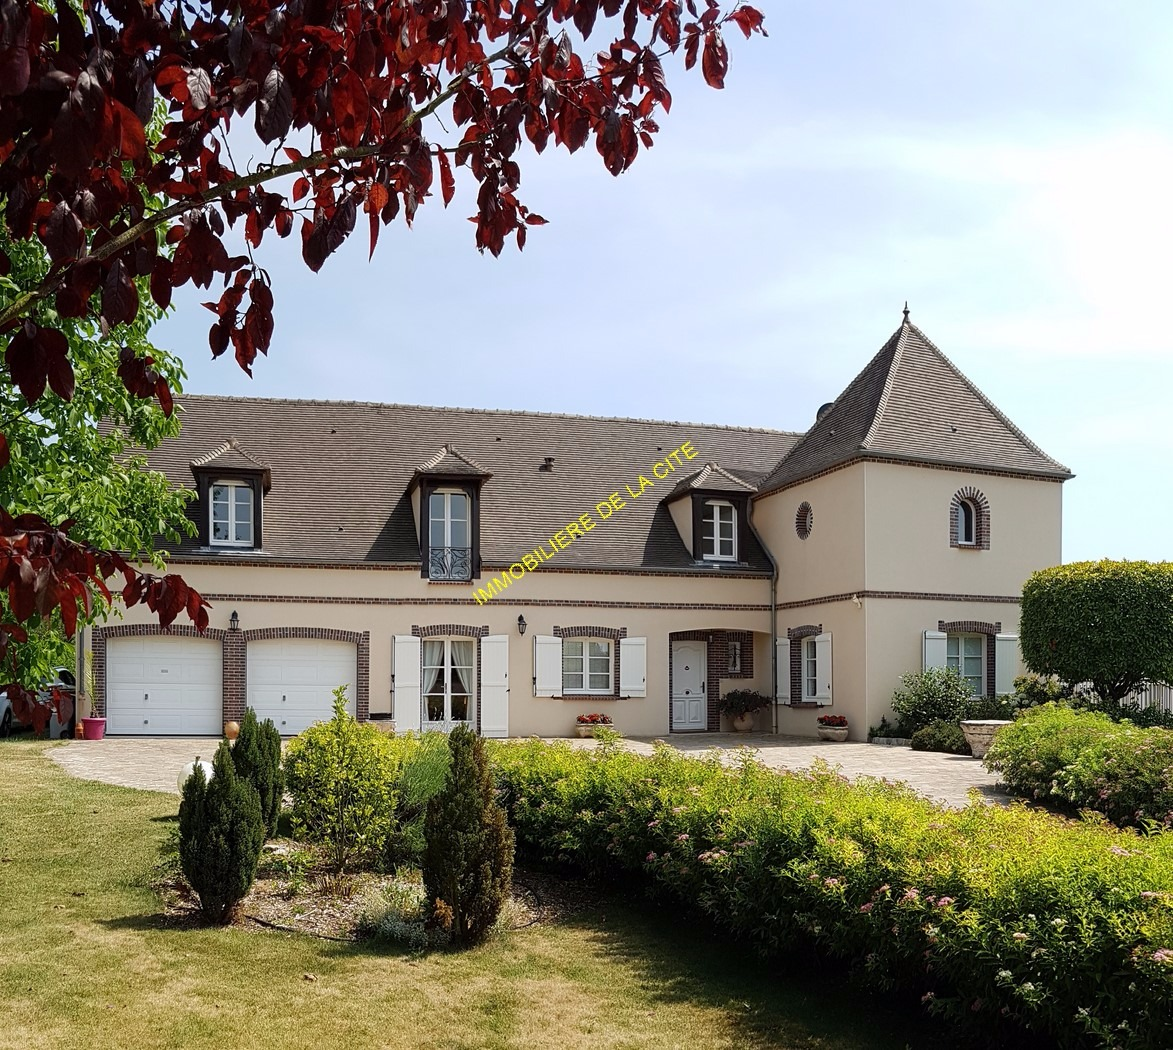 Superbe maison contemporaine 3000 m2 avec piscine for Bray sur seine piscine